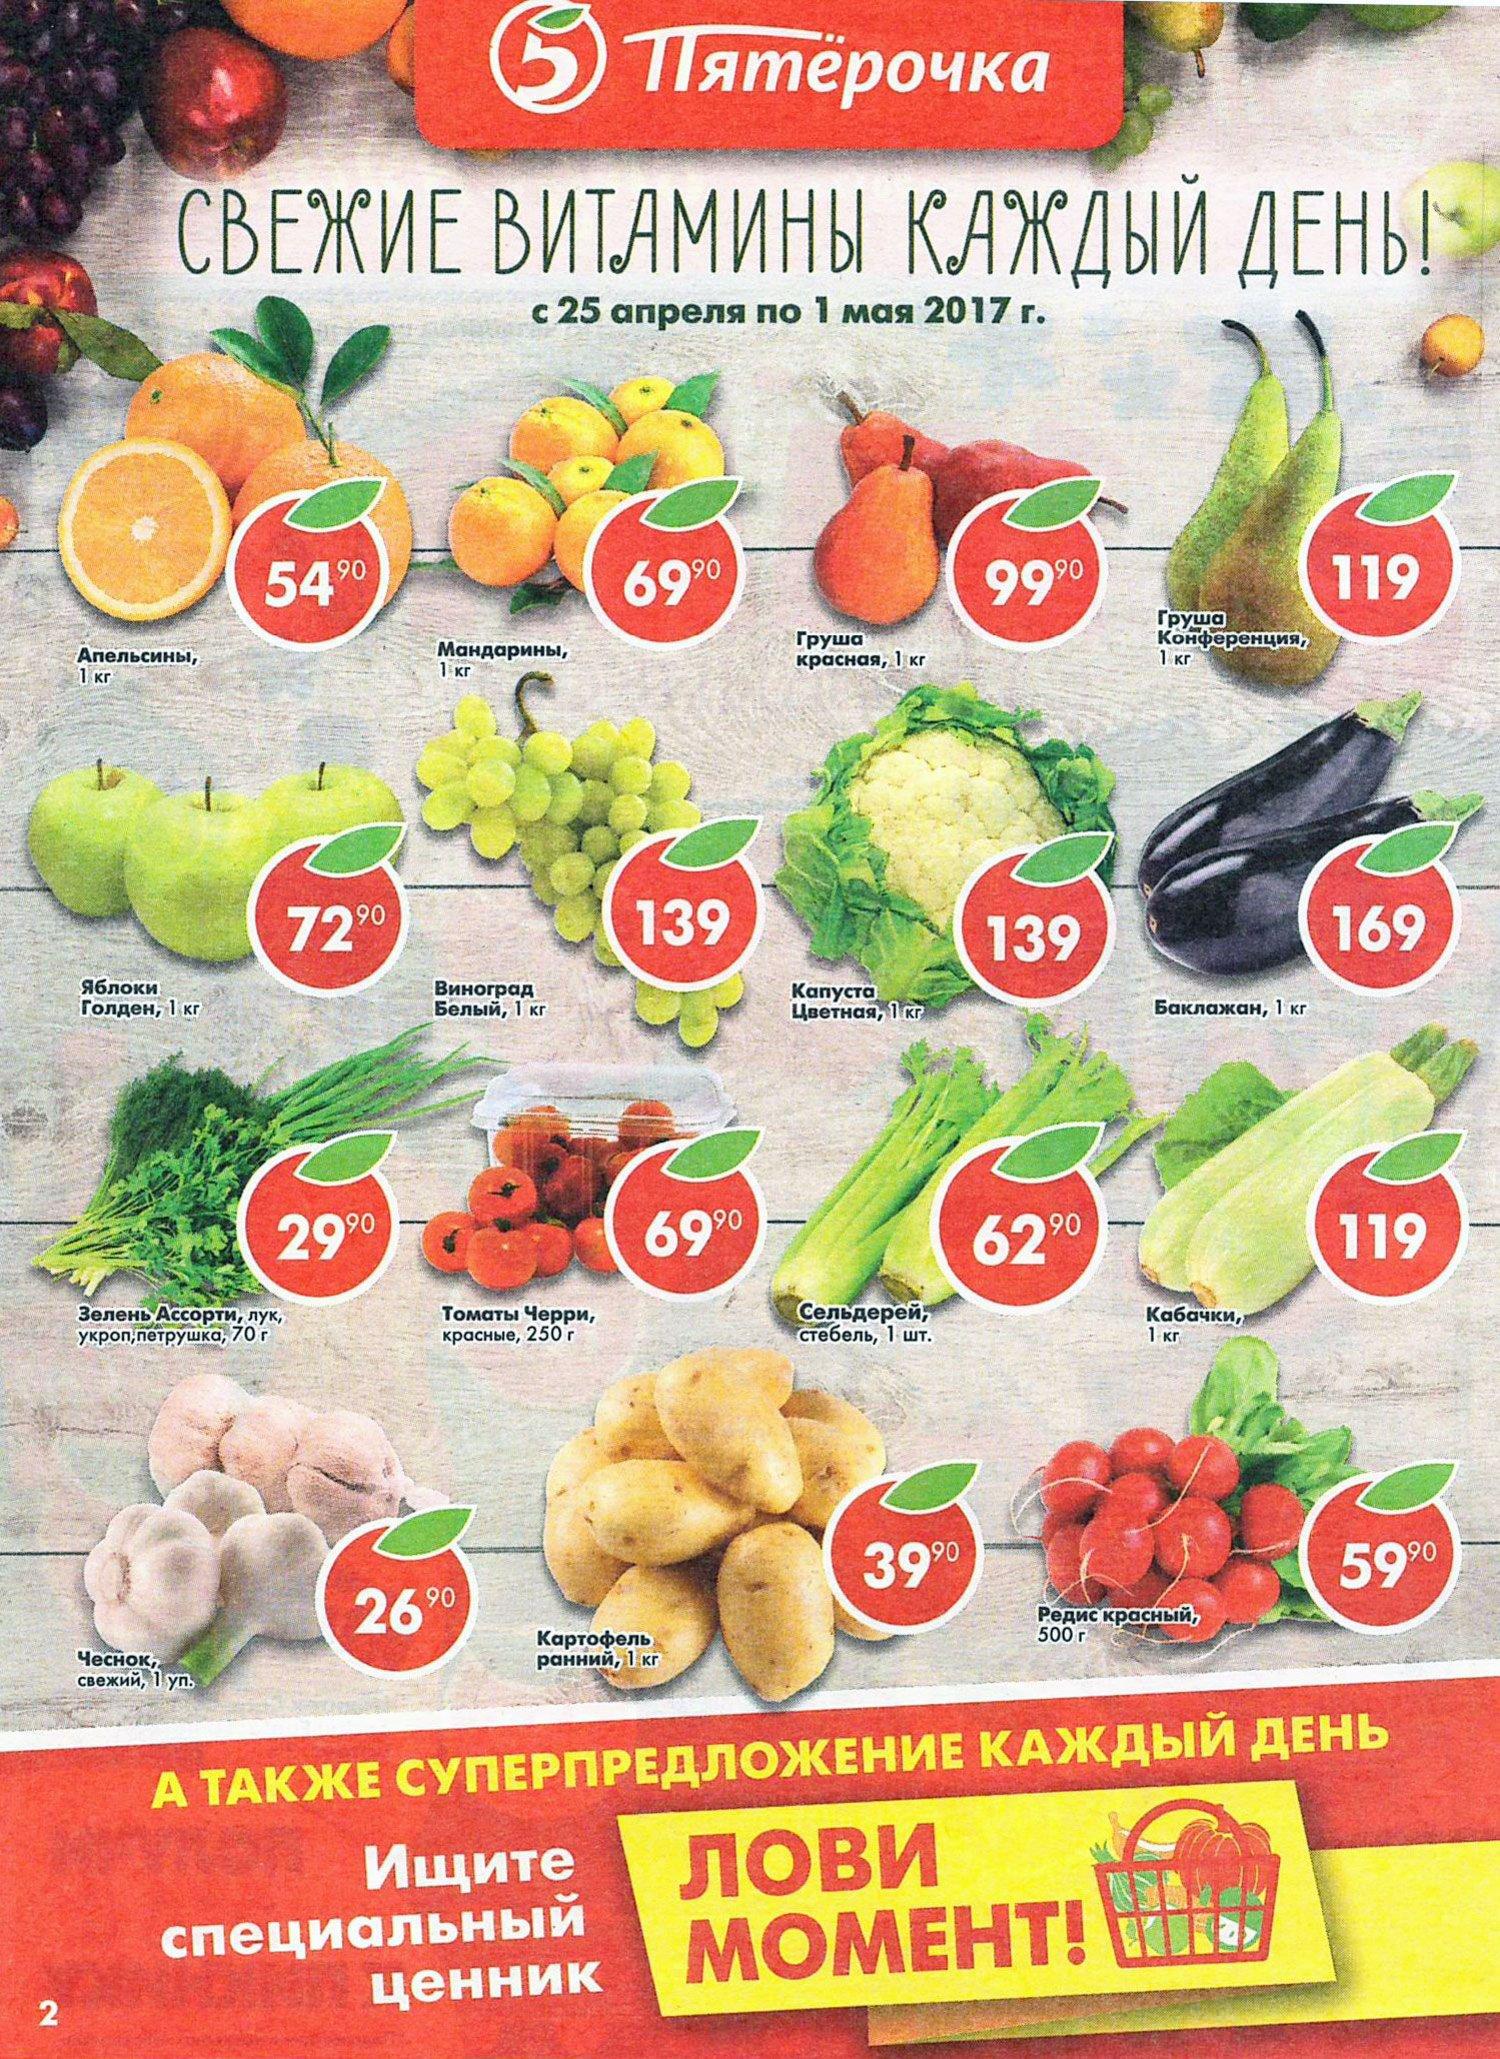 Каталог акций Пятерочка с 24 апреля по 1 мая 2017 - стр. 2